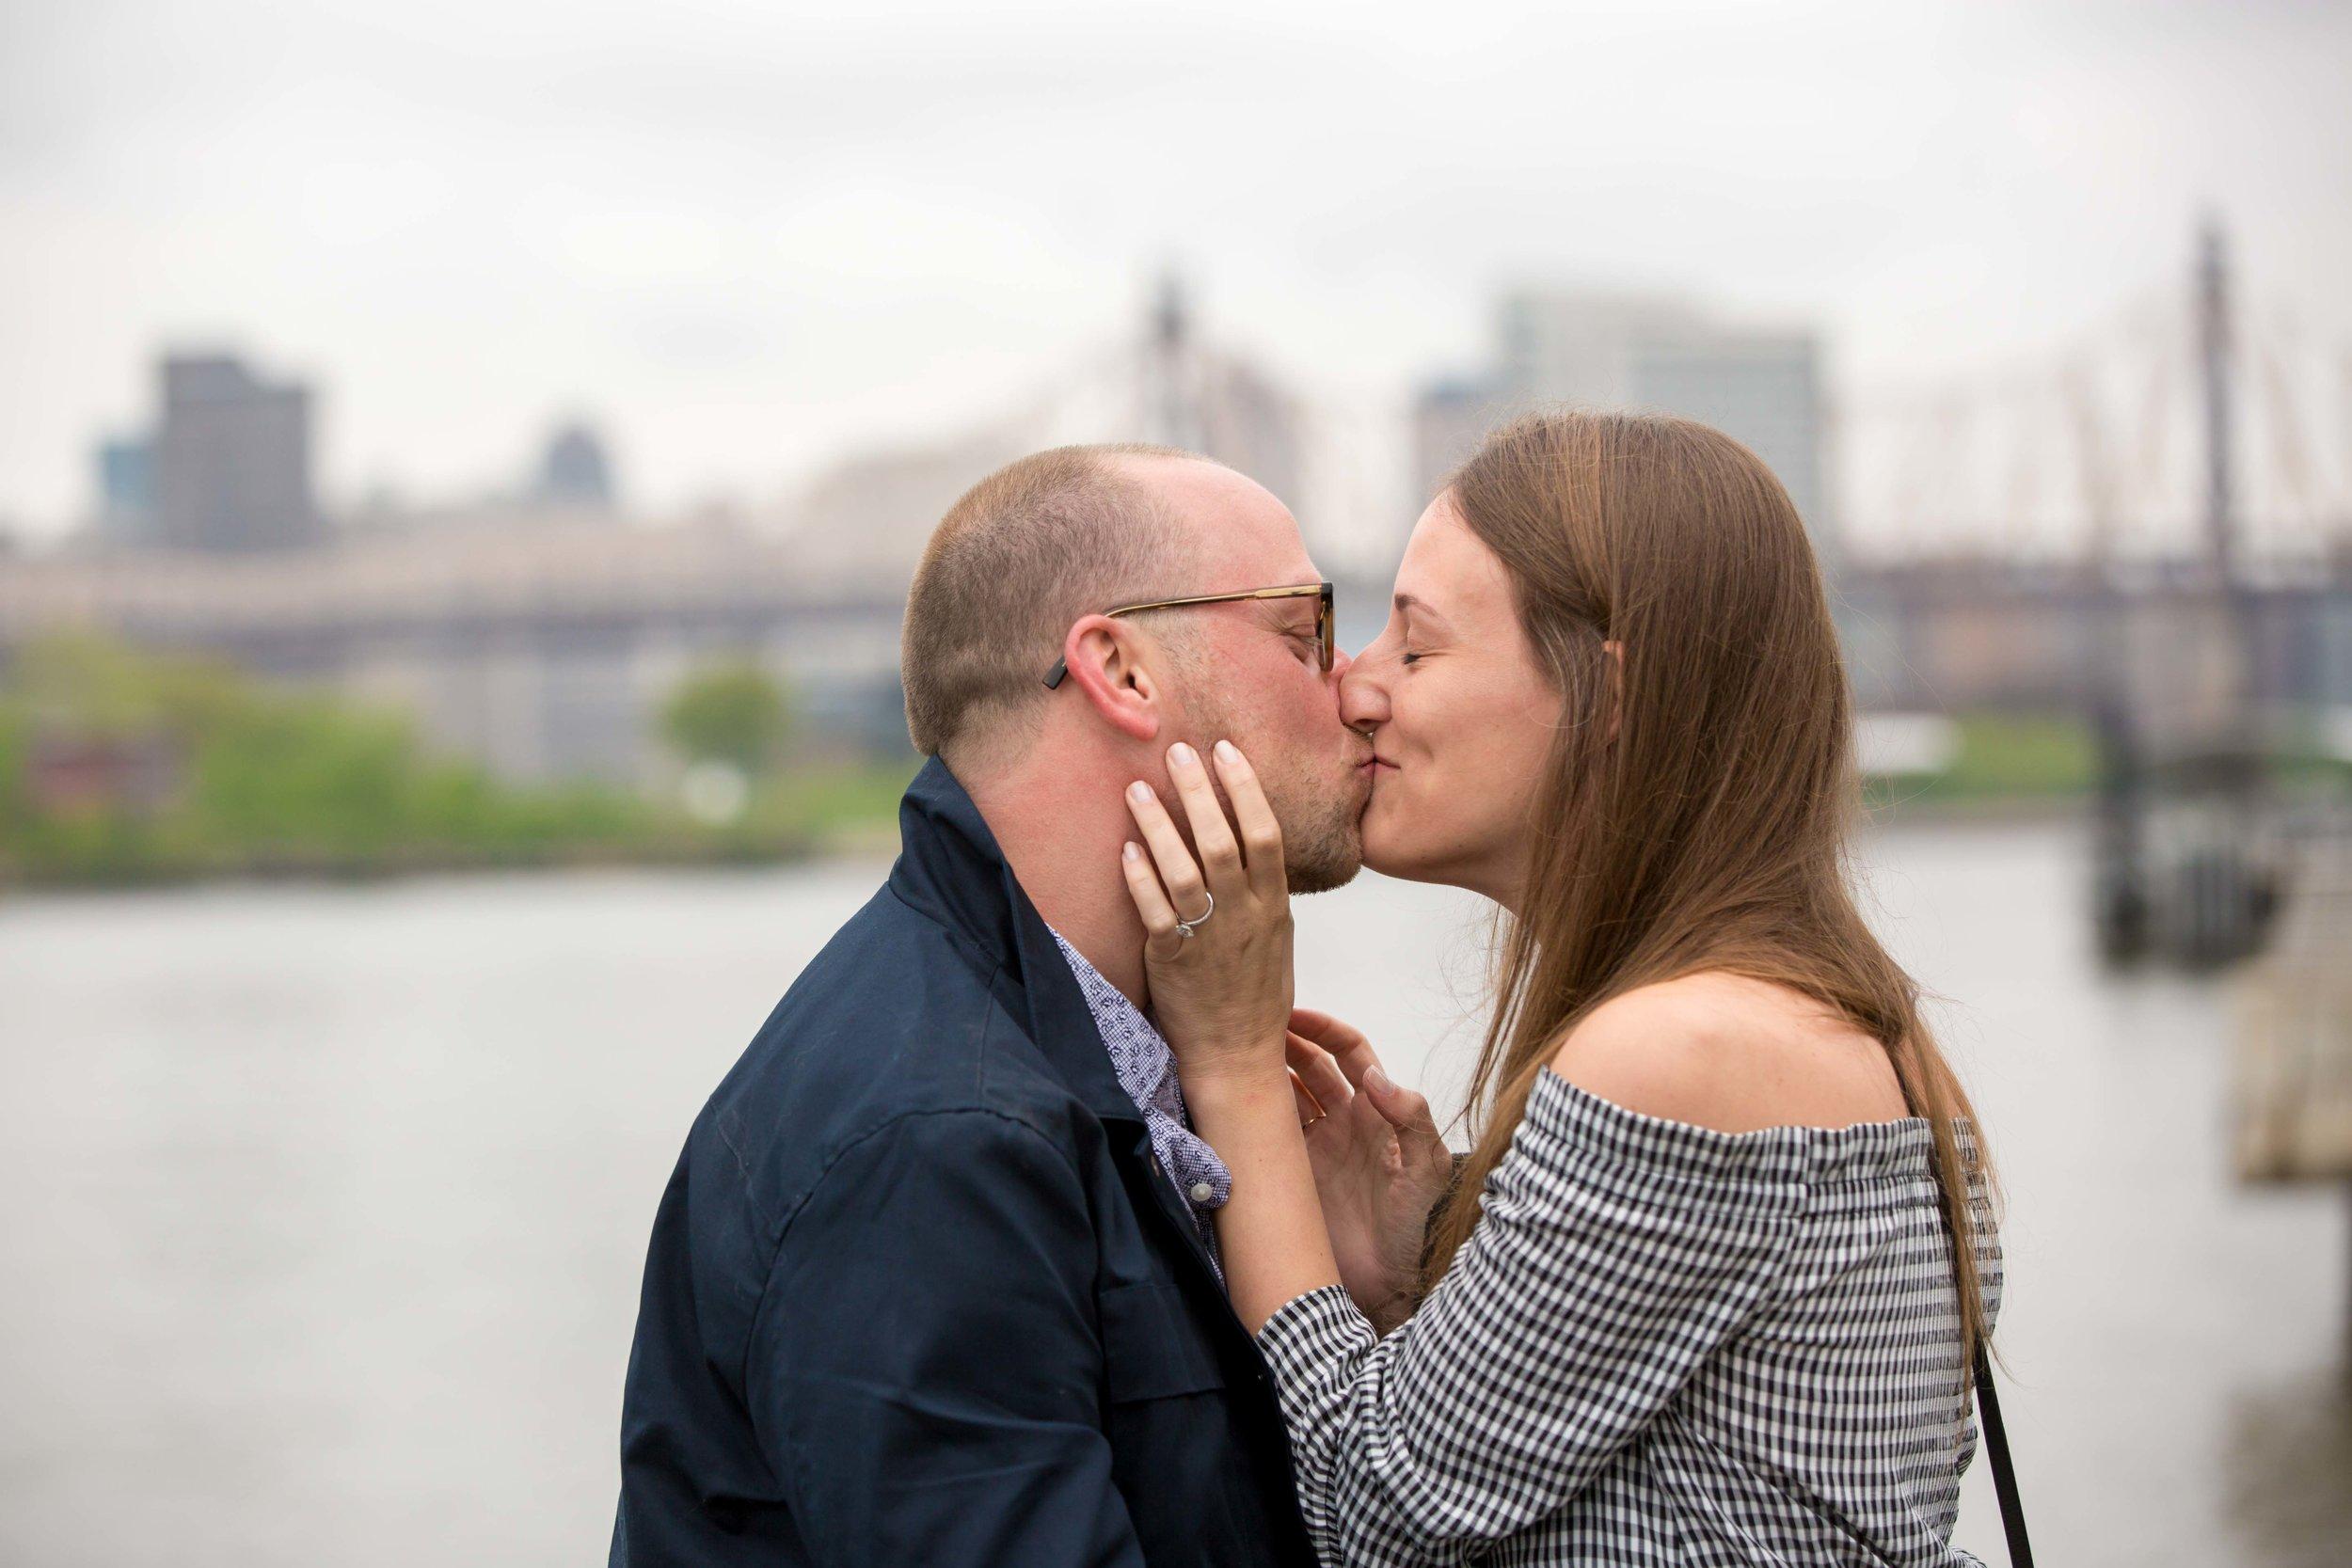 NYC Proposal Gantry Plaza State Park Engagement Photo Session Shoot Wedding Photographer